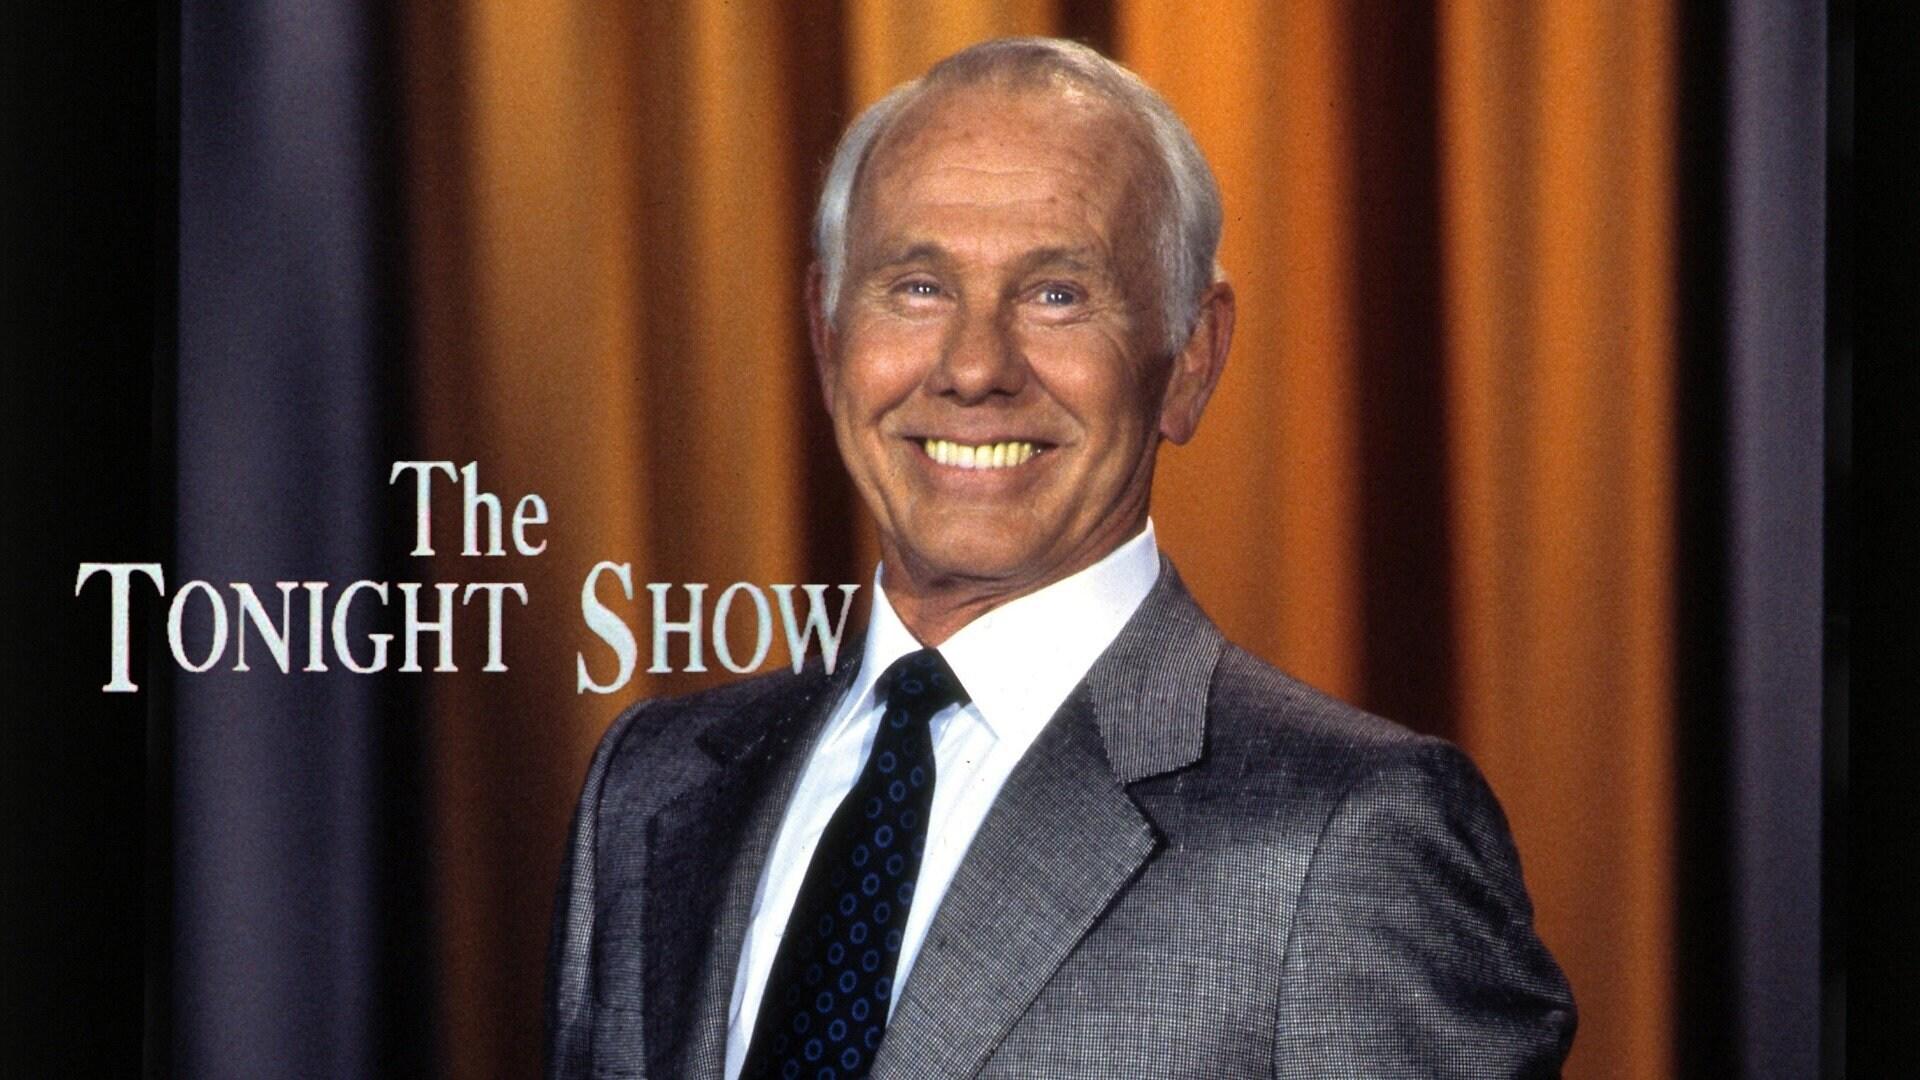 The Johnny Carson Show: Hollywood Icons Of The '90s - Lara Flynn Boyle (5/9/90)